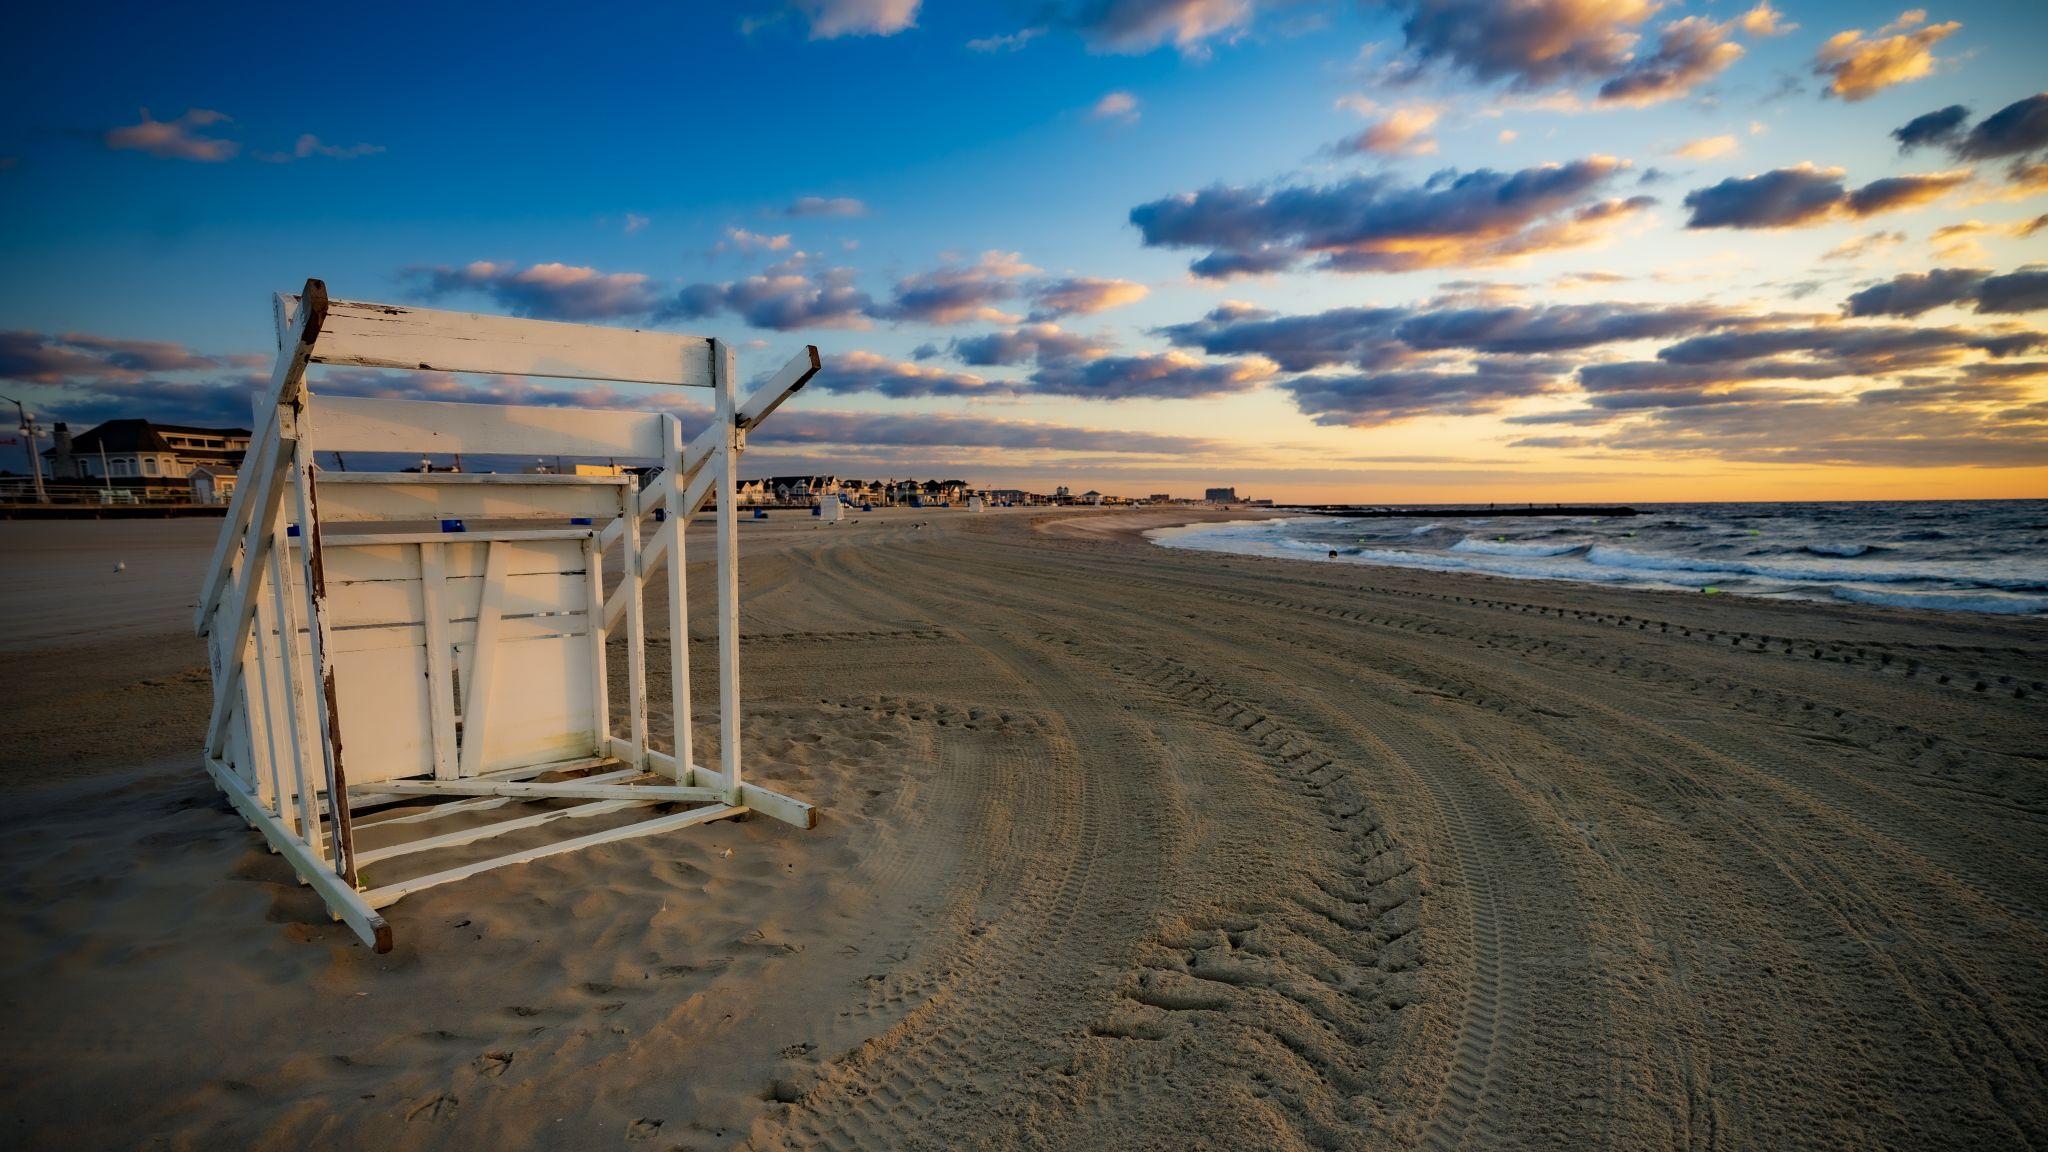 Avon-by-the-sea Jetty Beach, USA